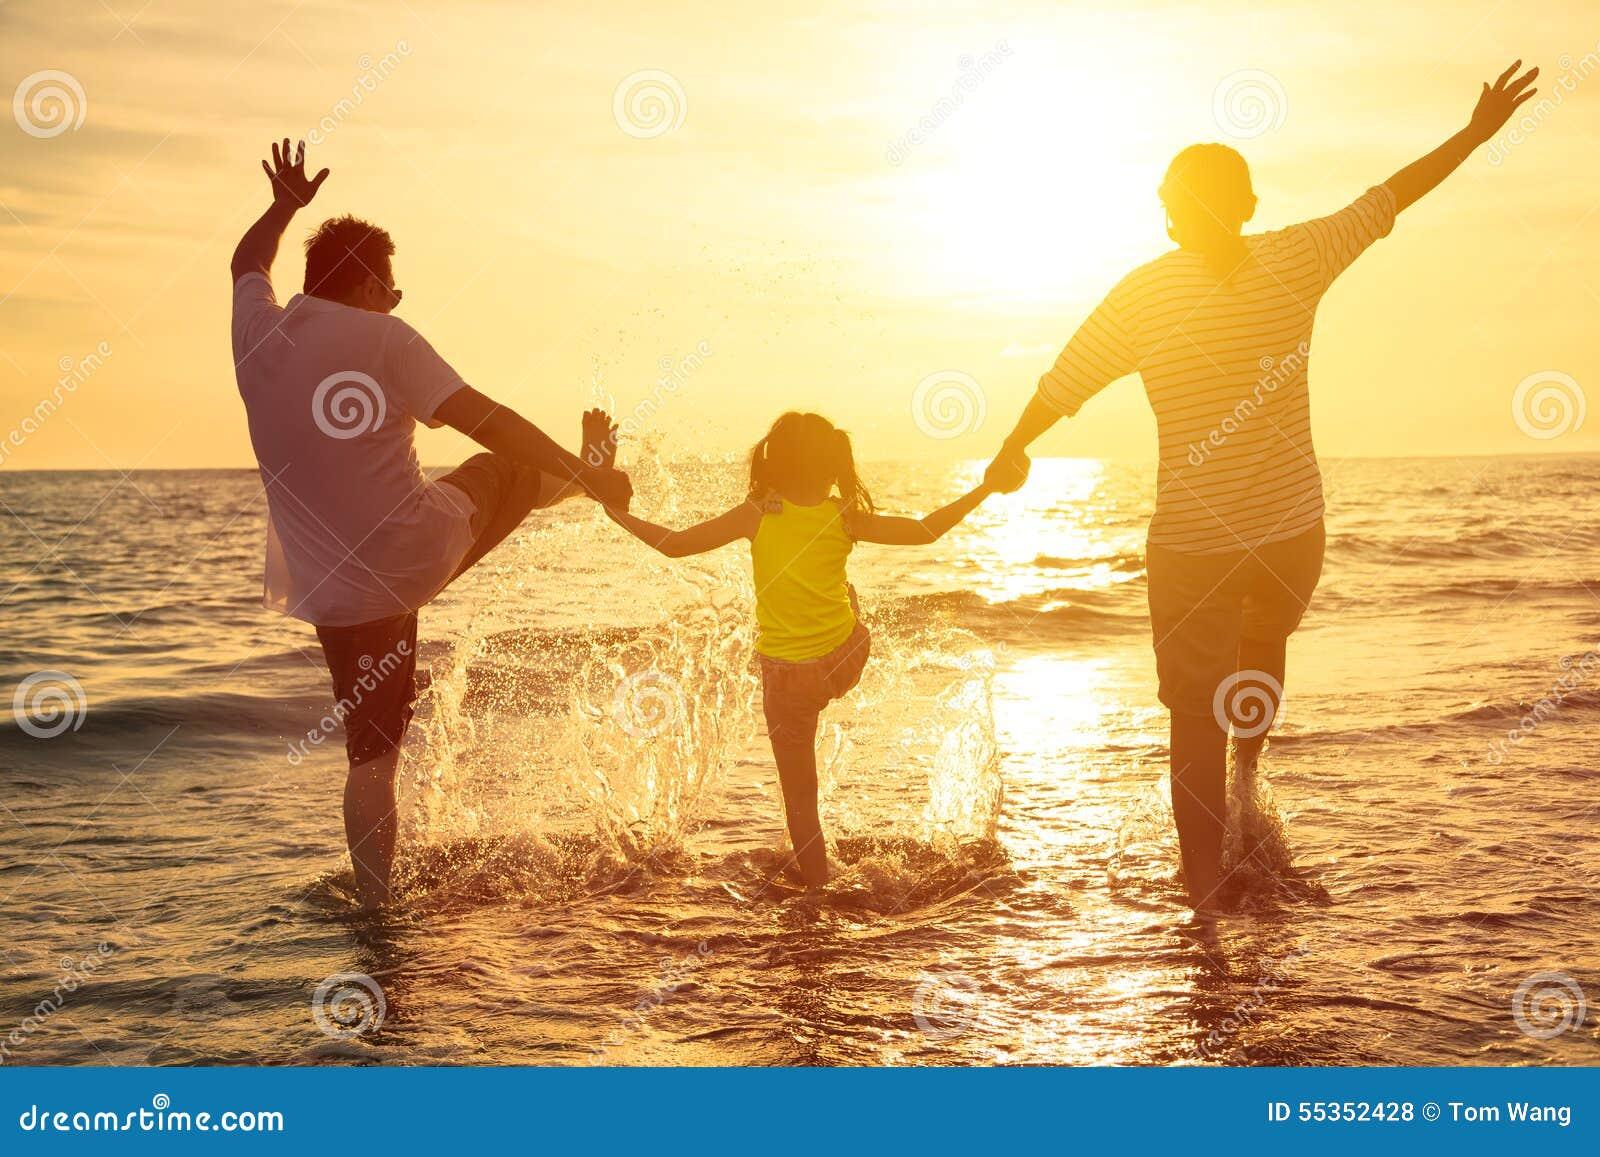 Family Enjoy Freedom At Field Under Umbrella Royalty-Free ...